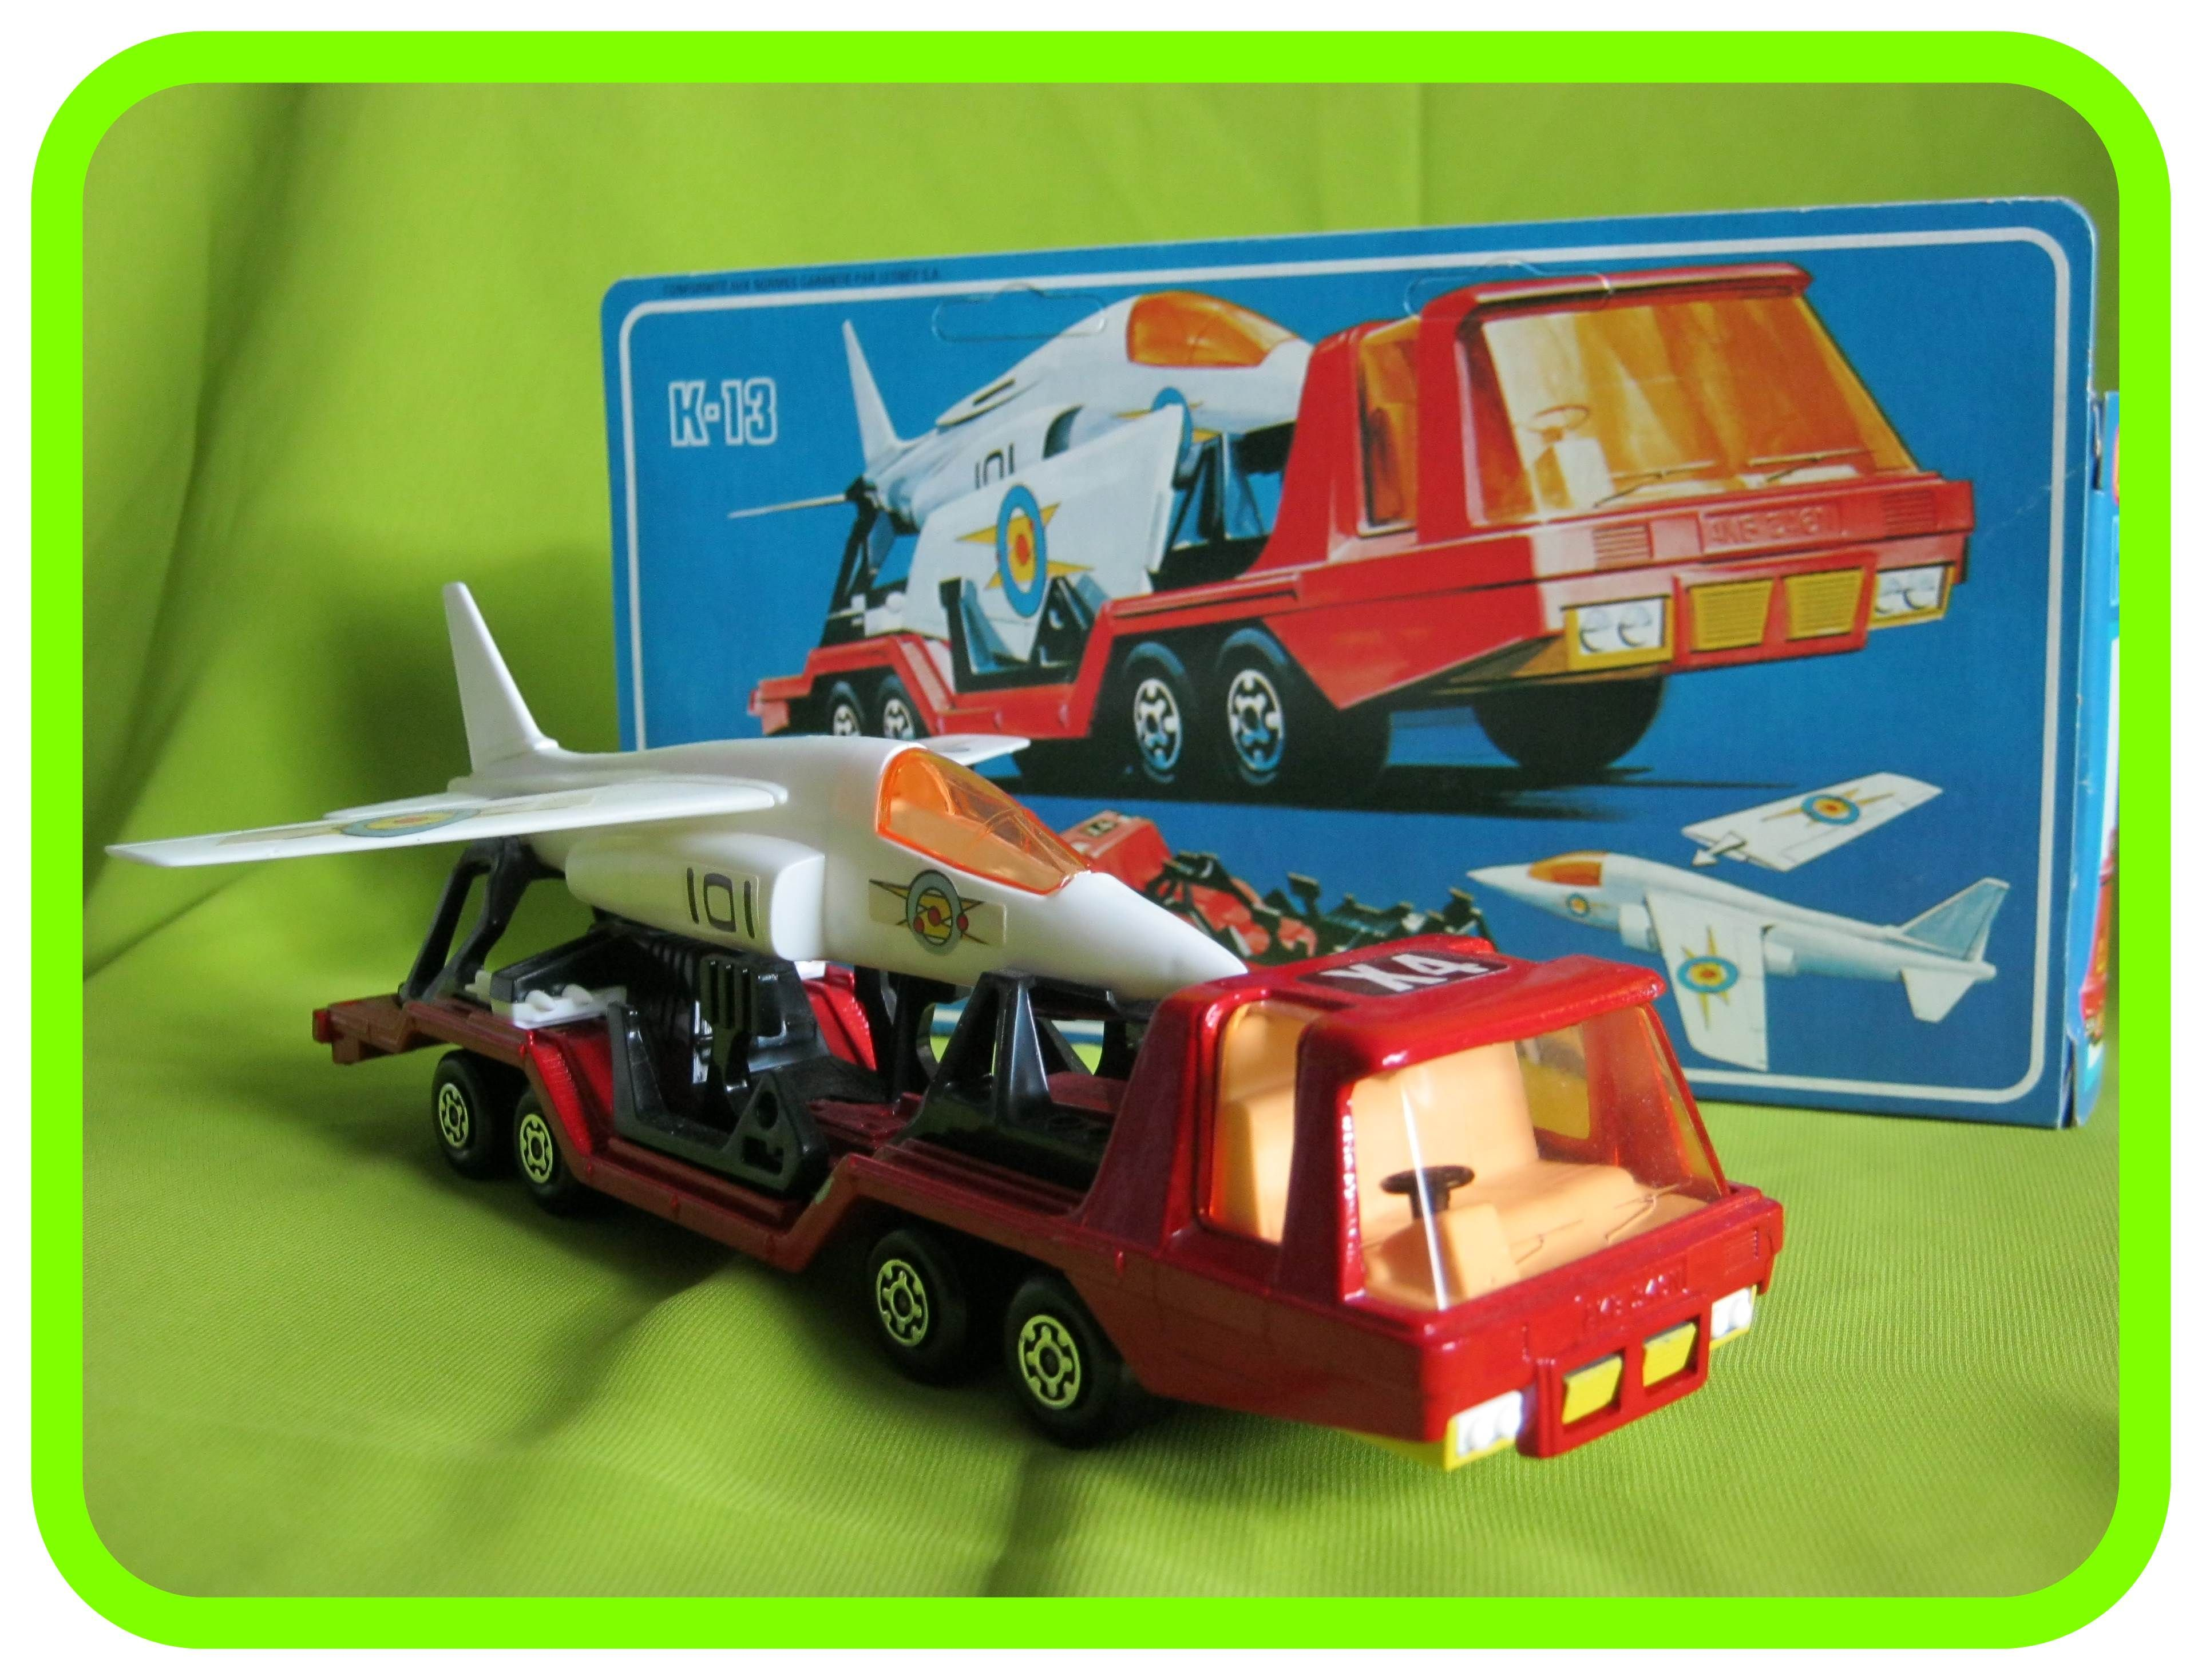 K13 Aircraft Transporter Toy Model Cars Toy Car Mattel Hot Wheels